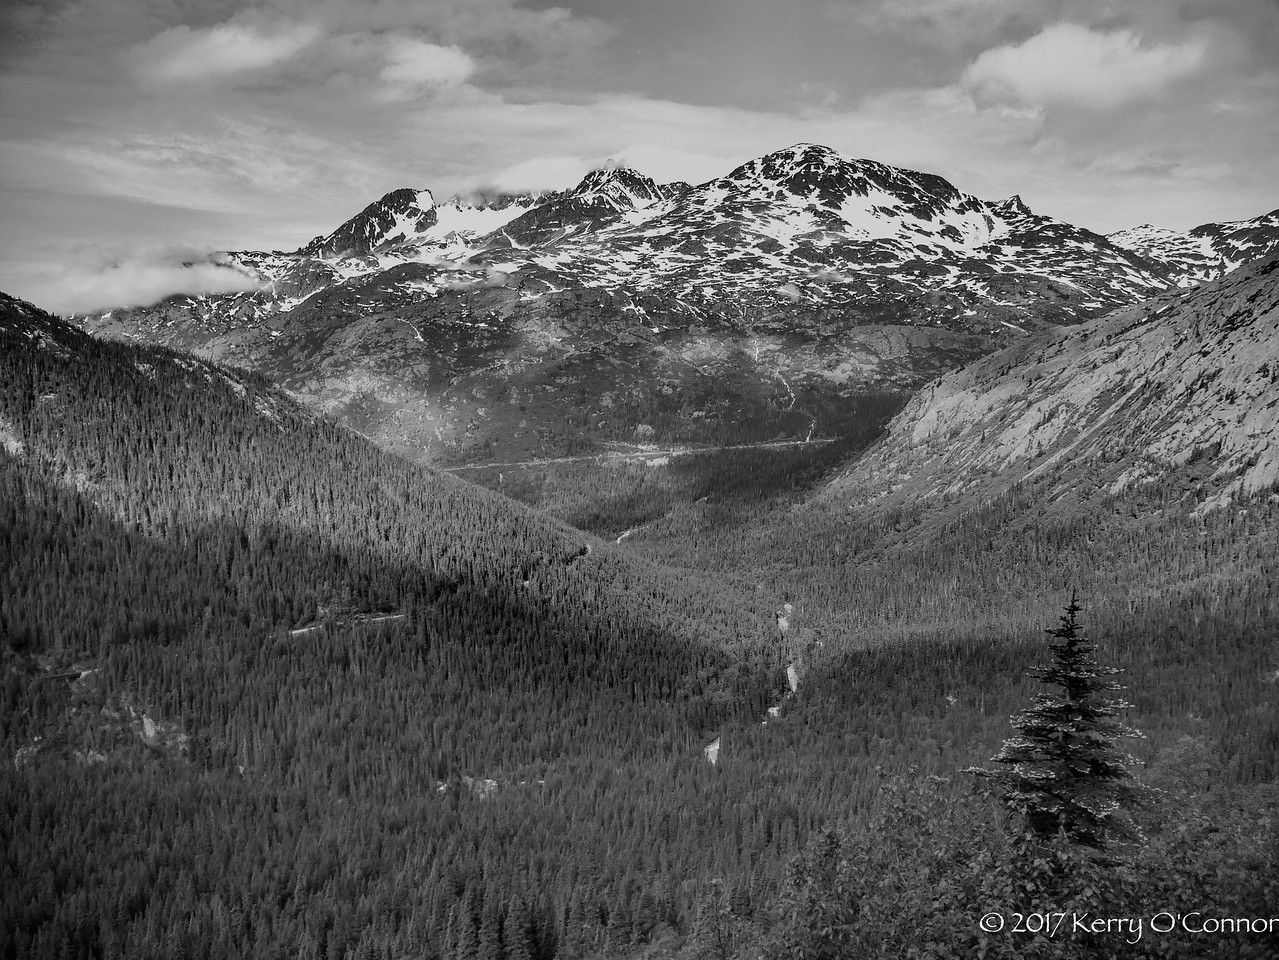 Valley by Slippery Rock